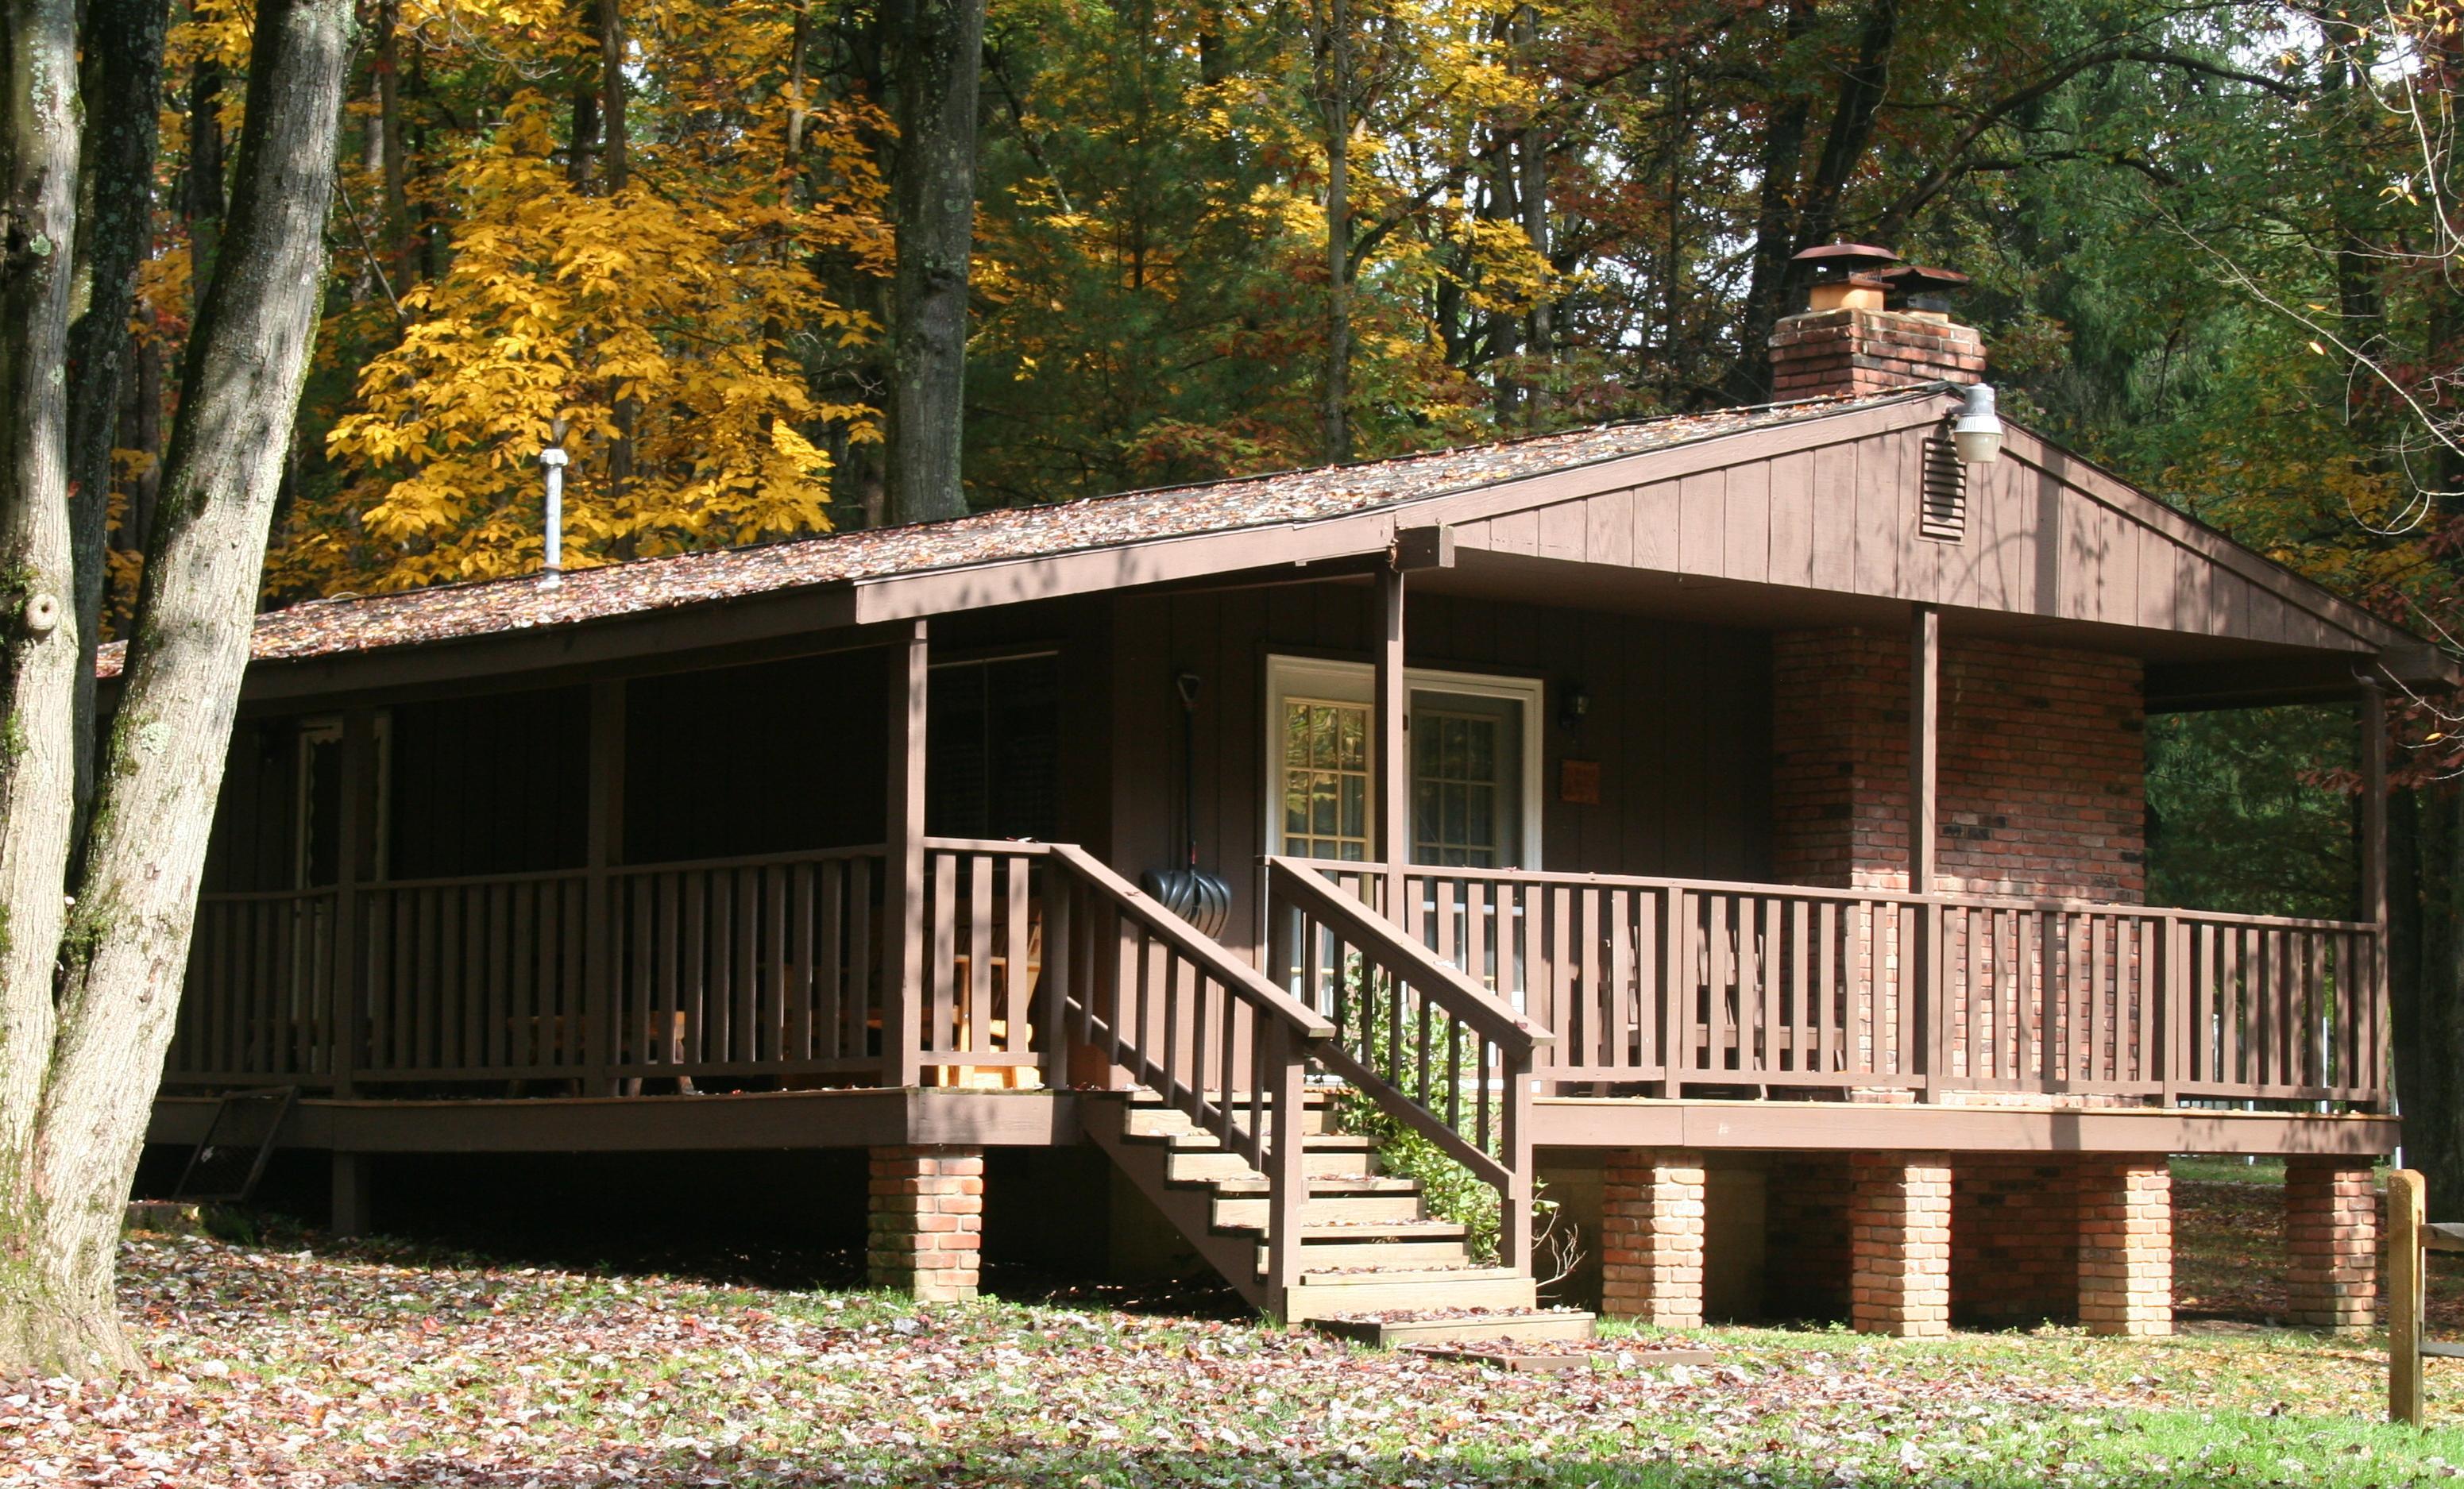 site koa campgrounds in sandusky type ohio cabins lodging bayshore